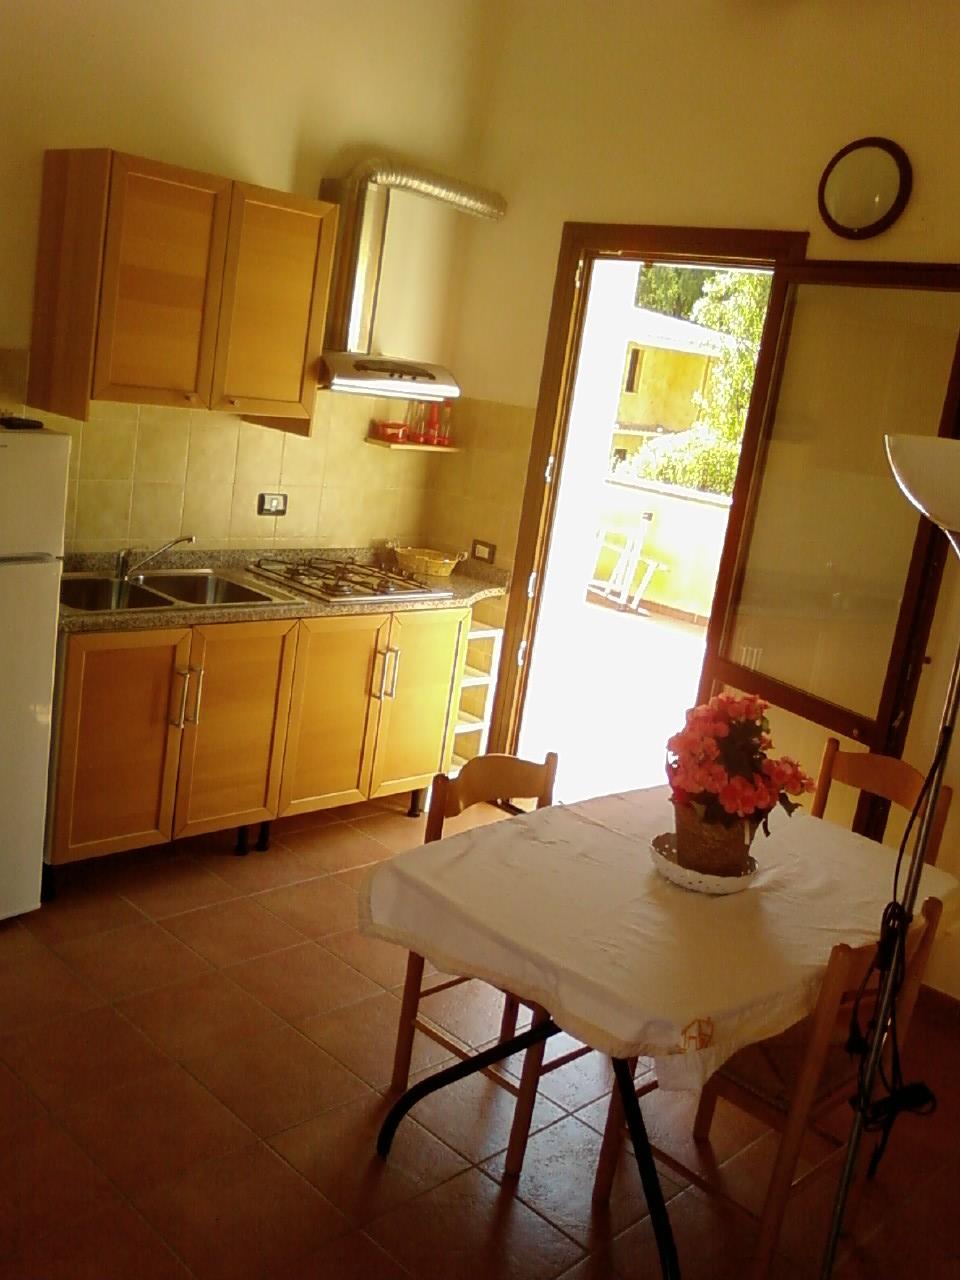 affitto appartamento mare castiadas 5304 (20110303100345-2011-71592-NDP.jpg)